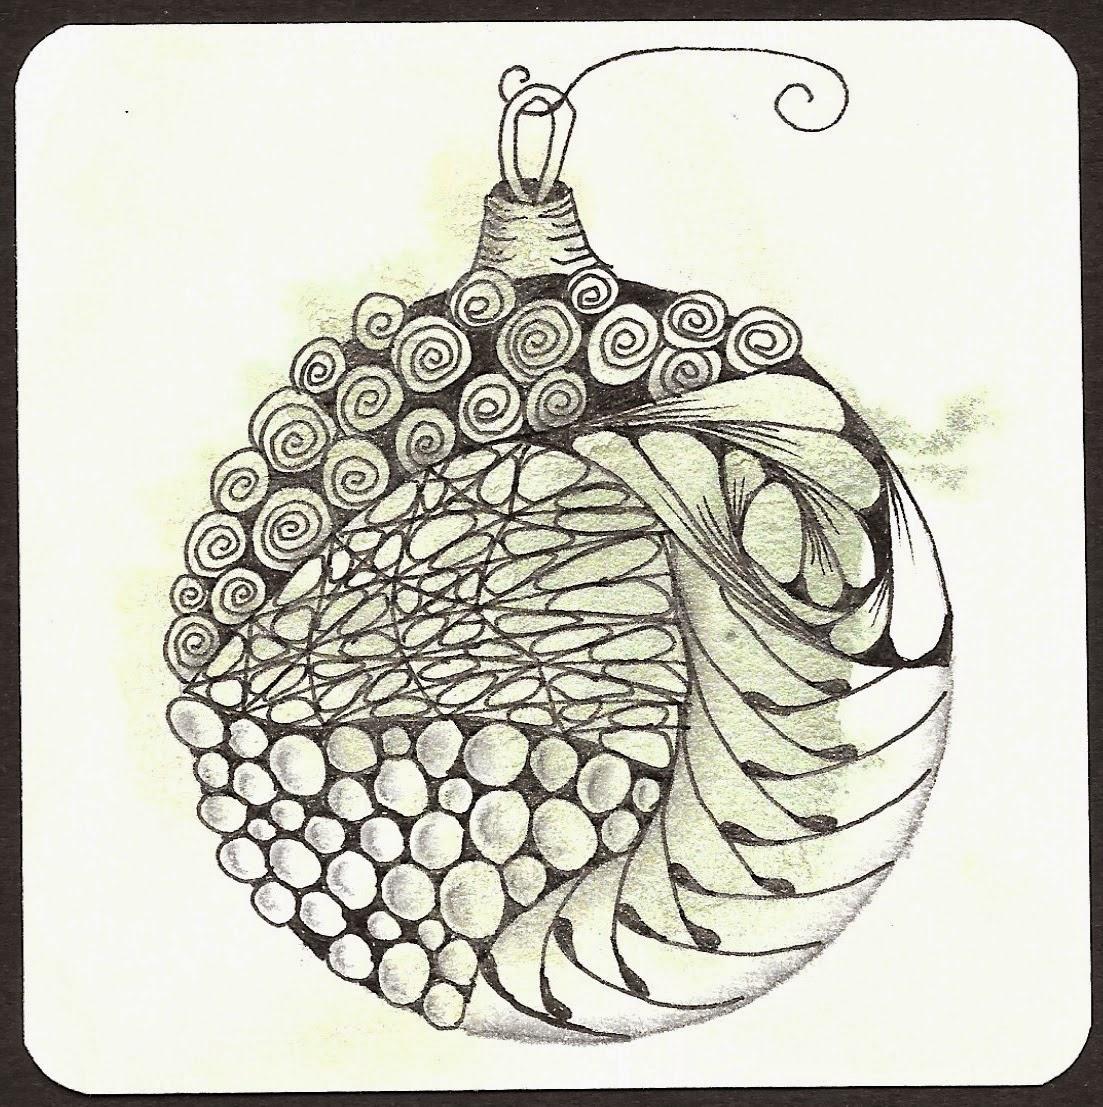 thehappytangler: Four More Christmas Ornament Zentangles